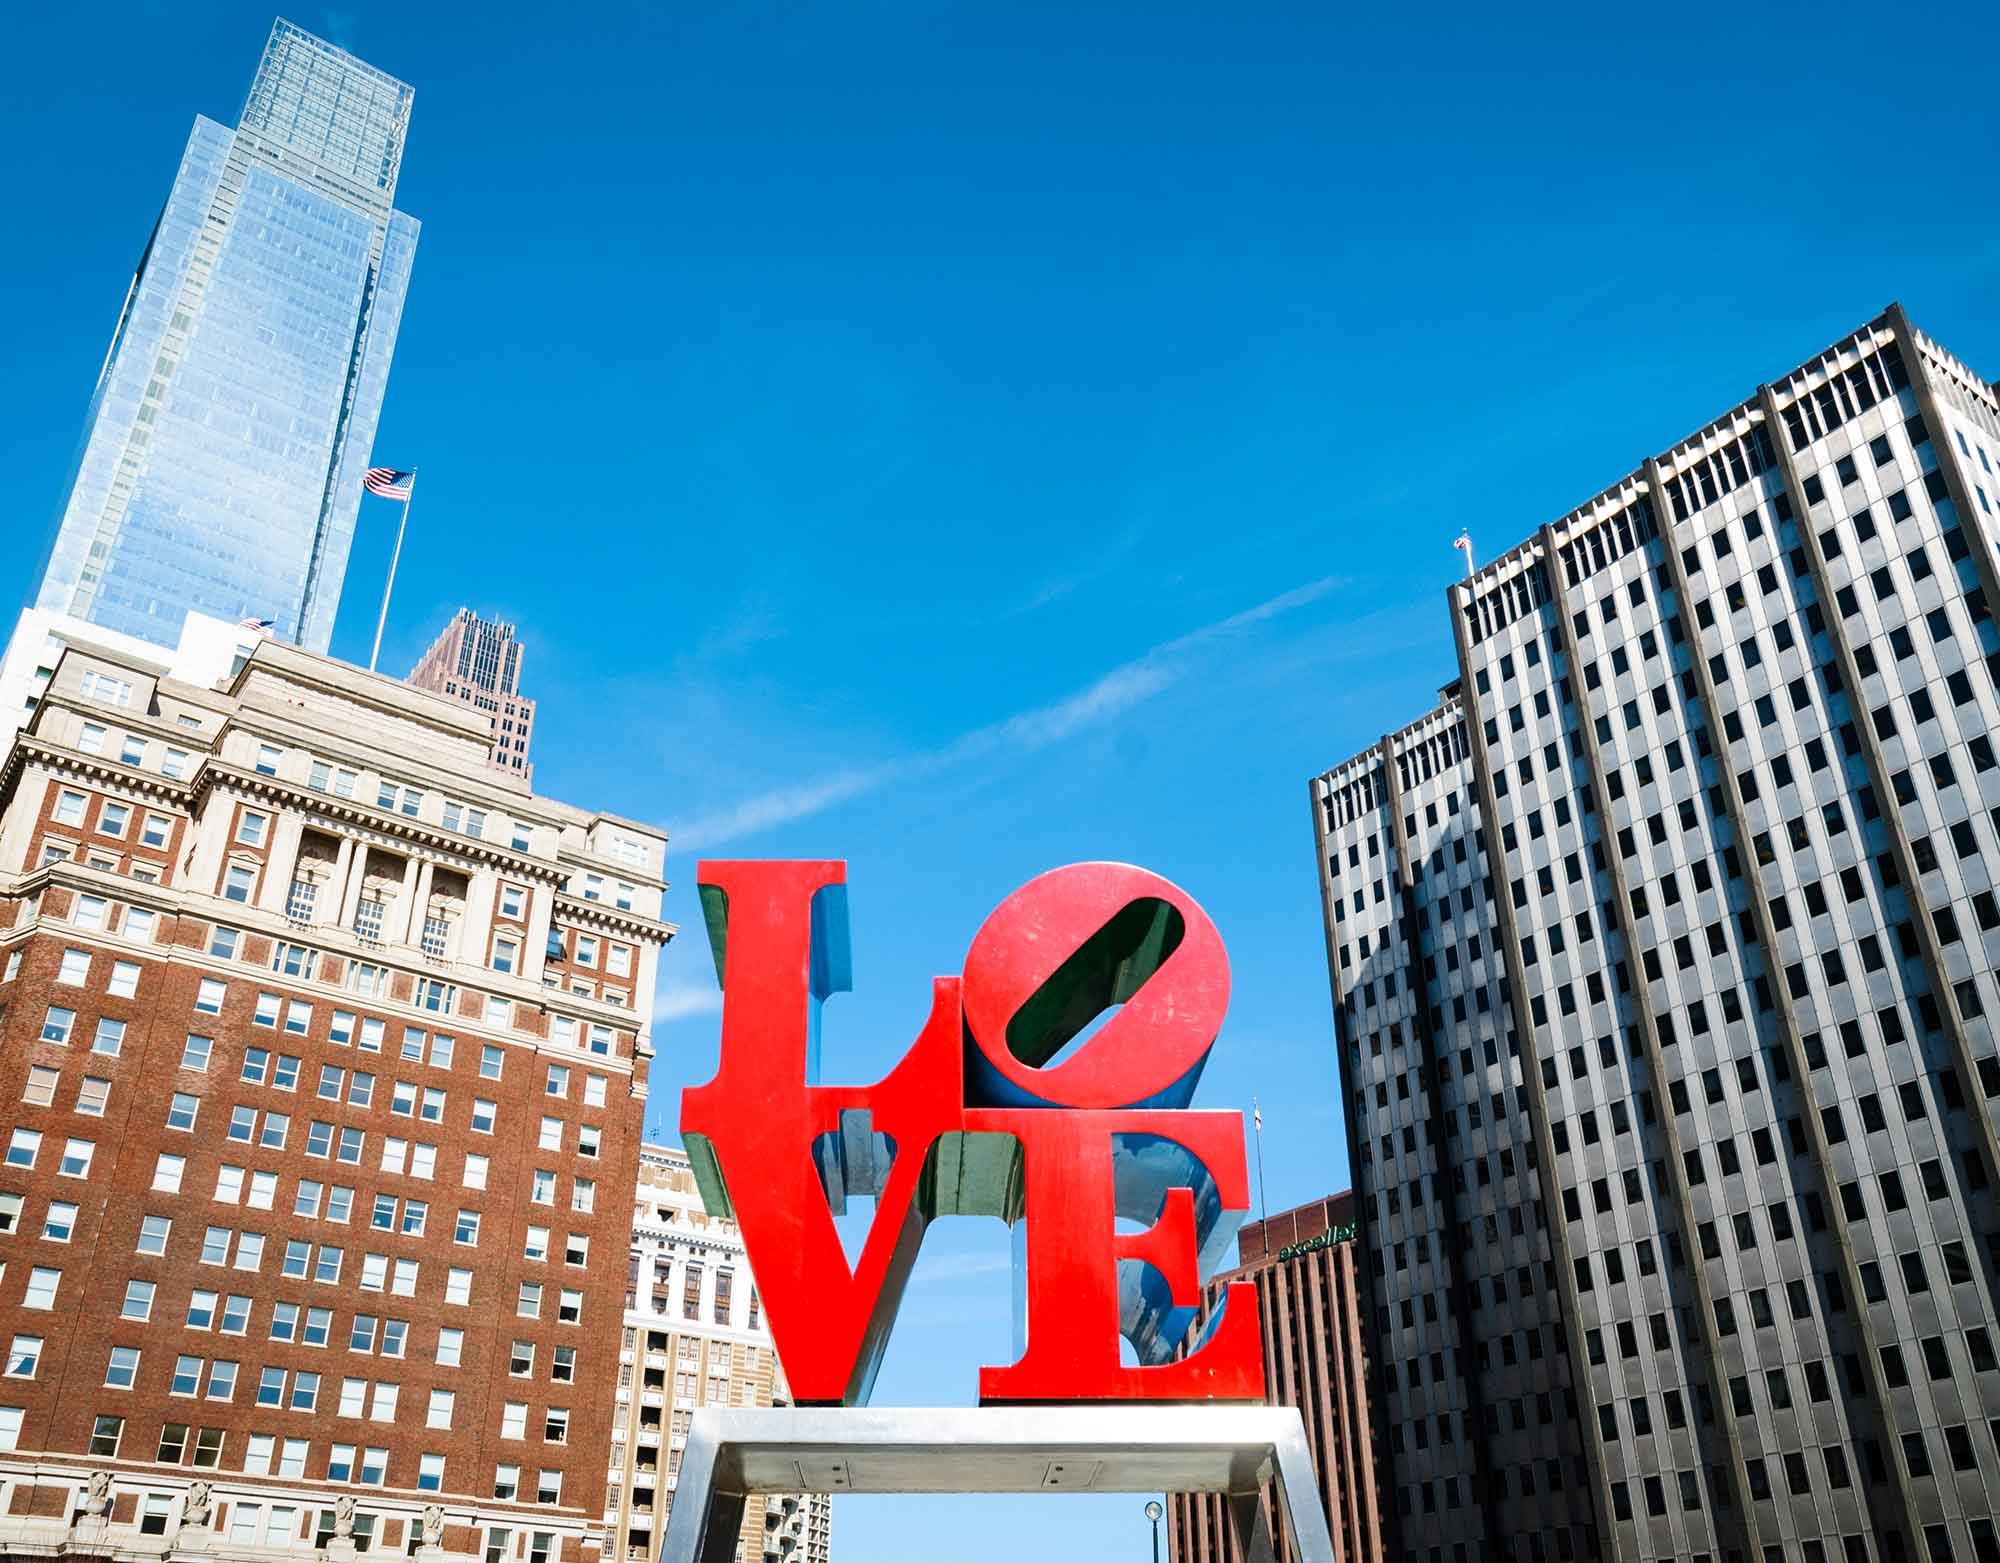 Love Sculpture in Philadelphia